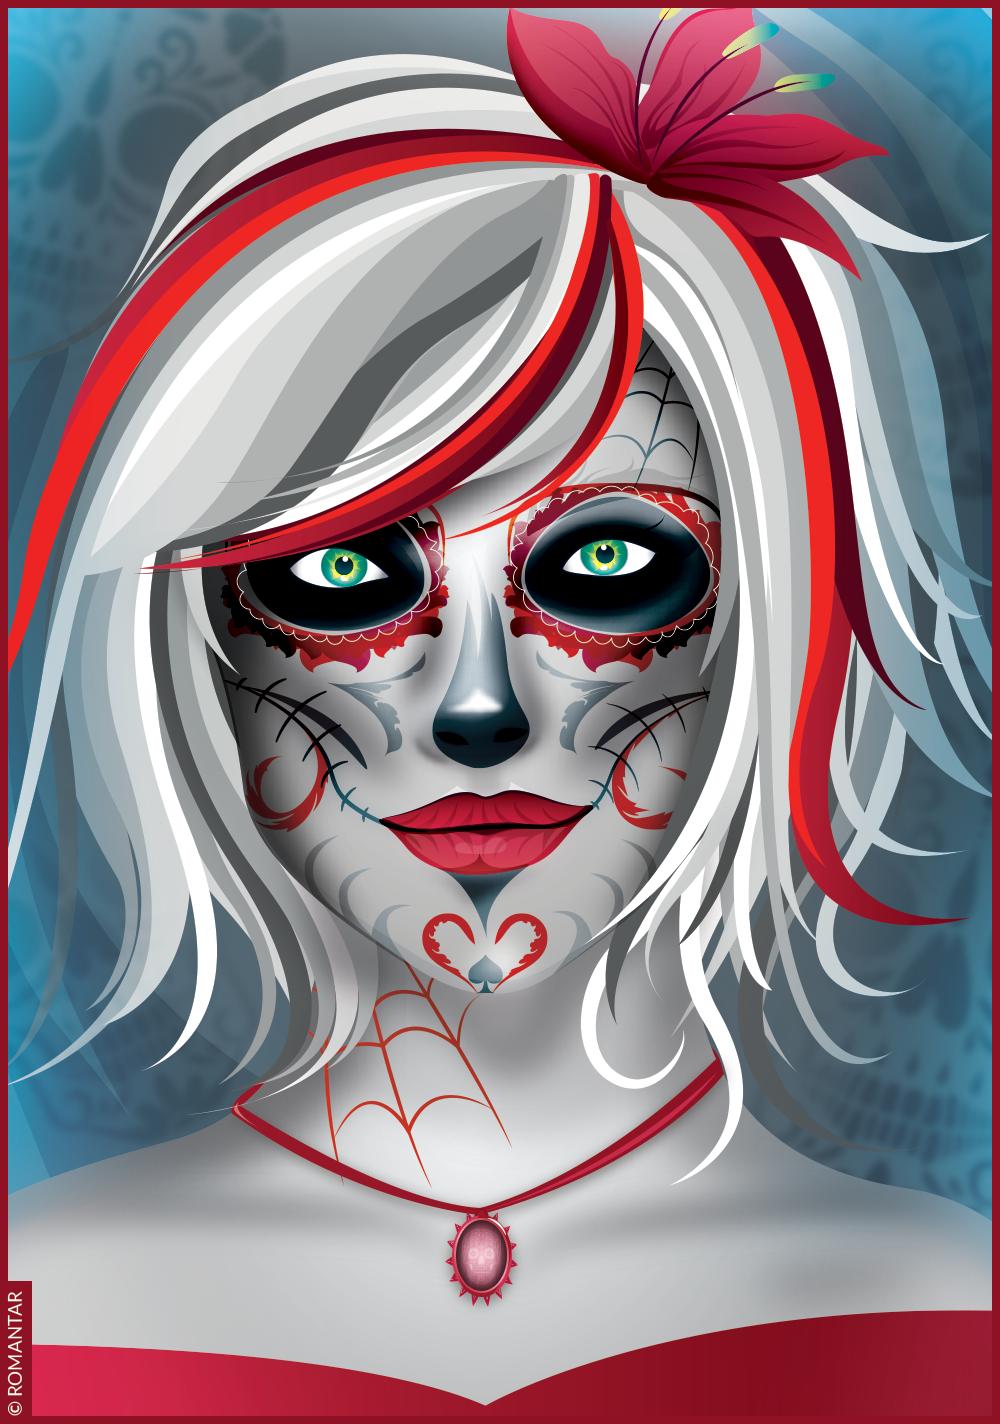 woman_sugar_skull_by_romantar-dcb64hk.png